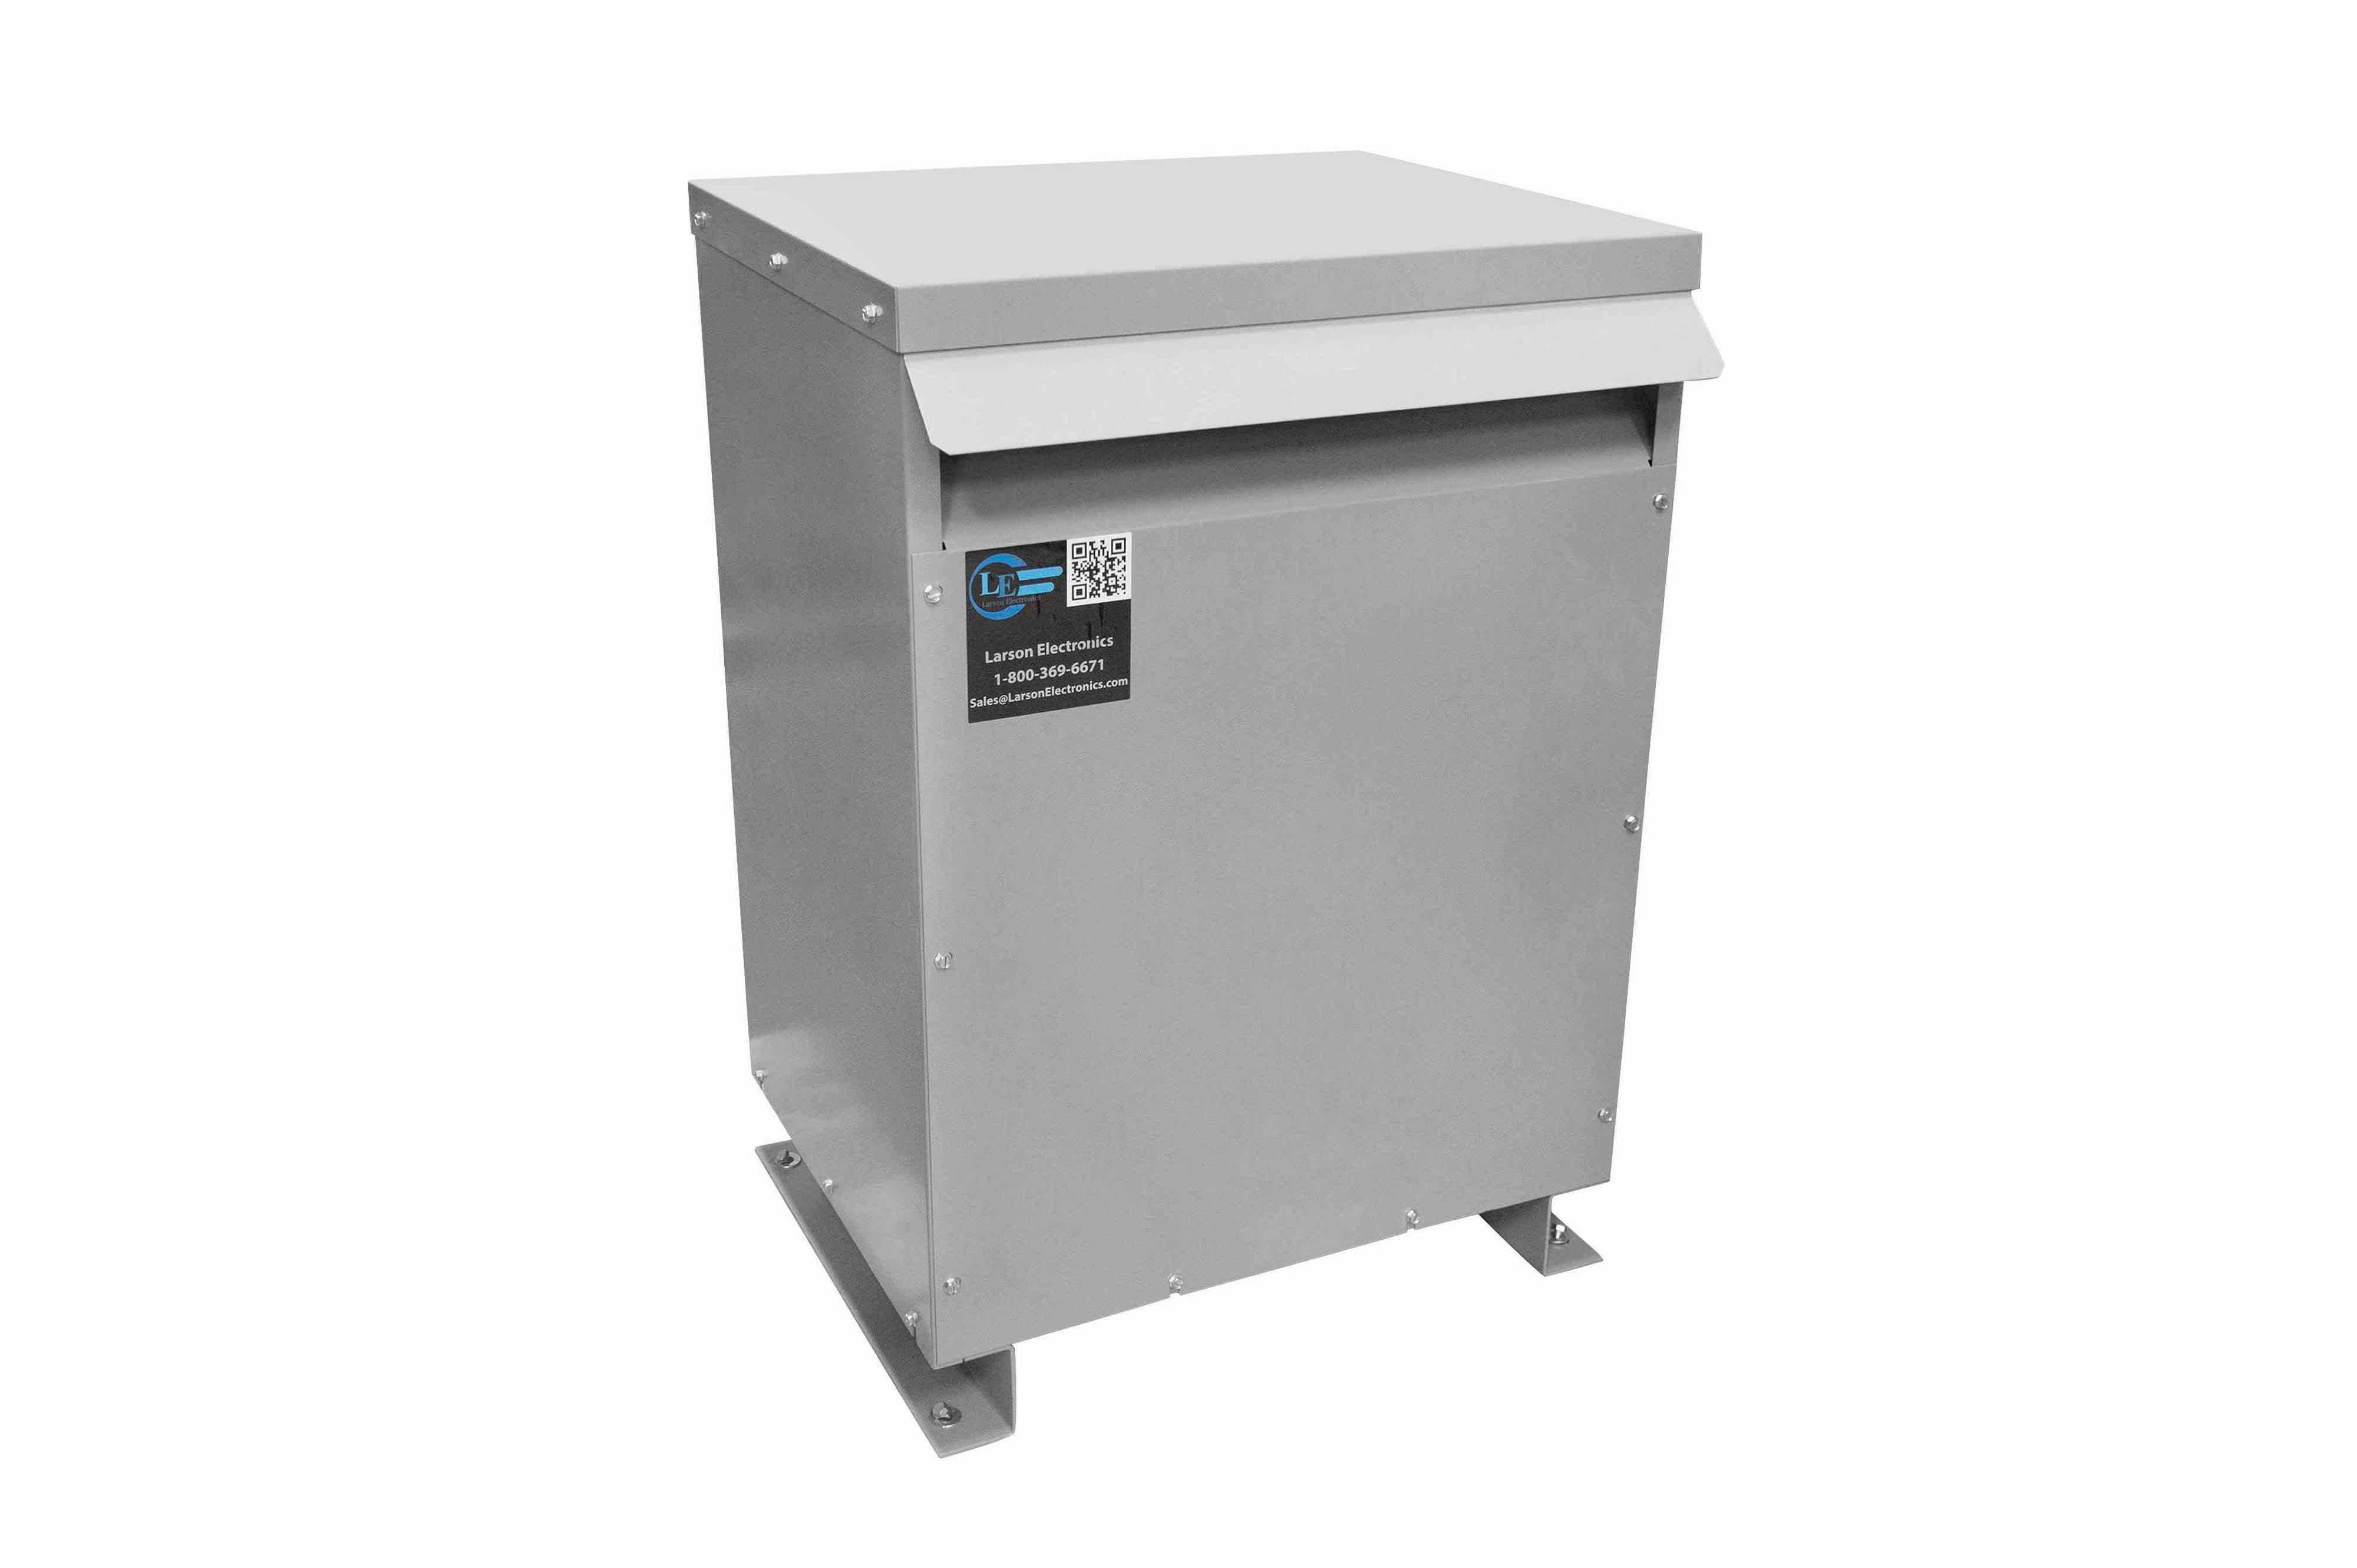 32.5 kVA 3PH Isolation Transformer, 600V Wye Primary, 480Y/277 Wye-N Secondary, N3R, Ventilated, 60 Hz